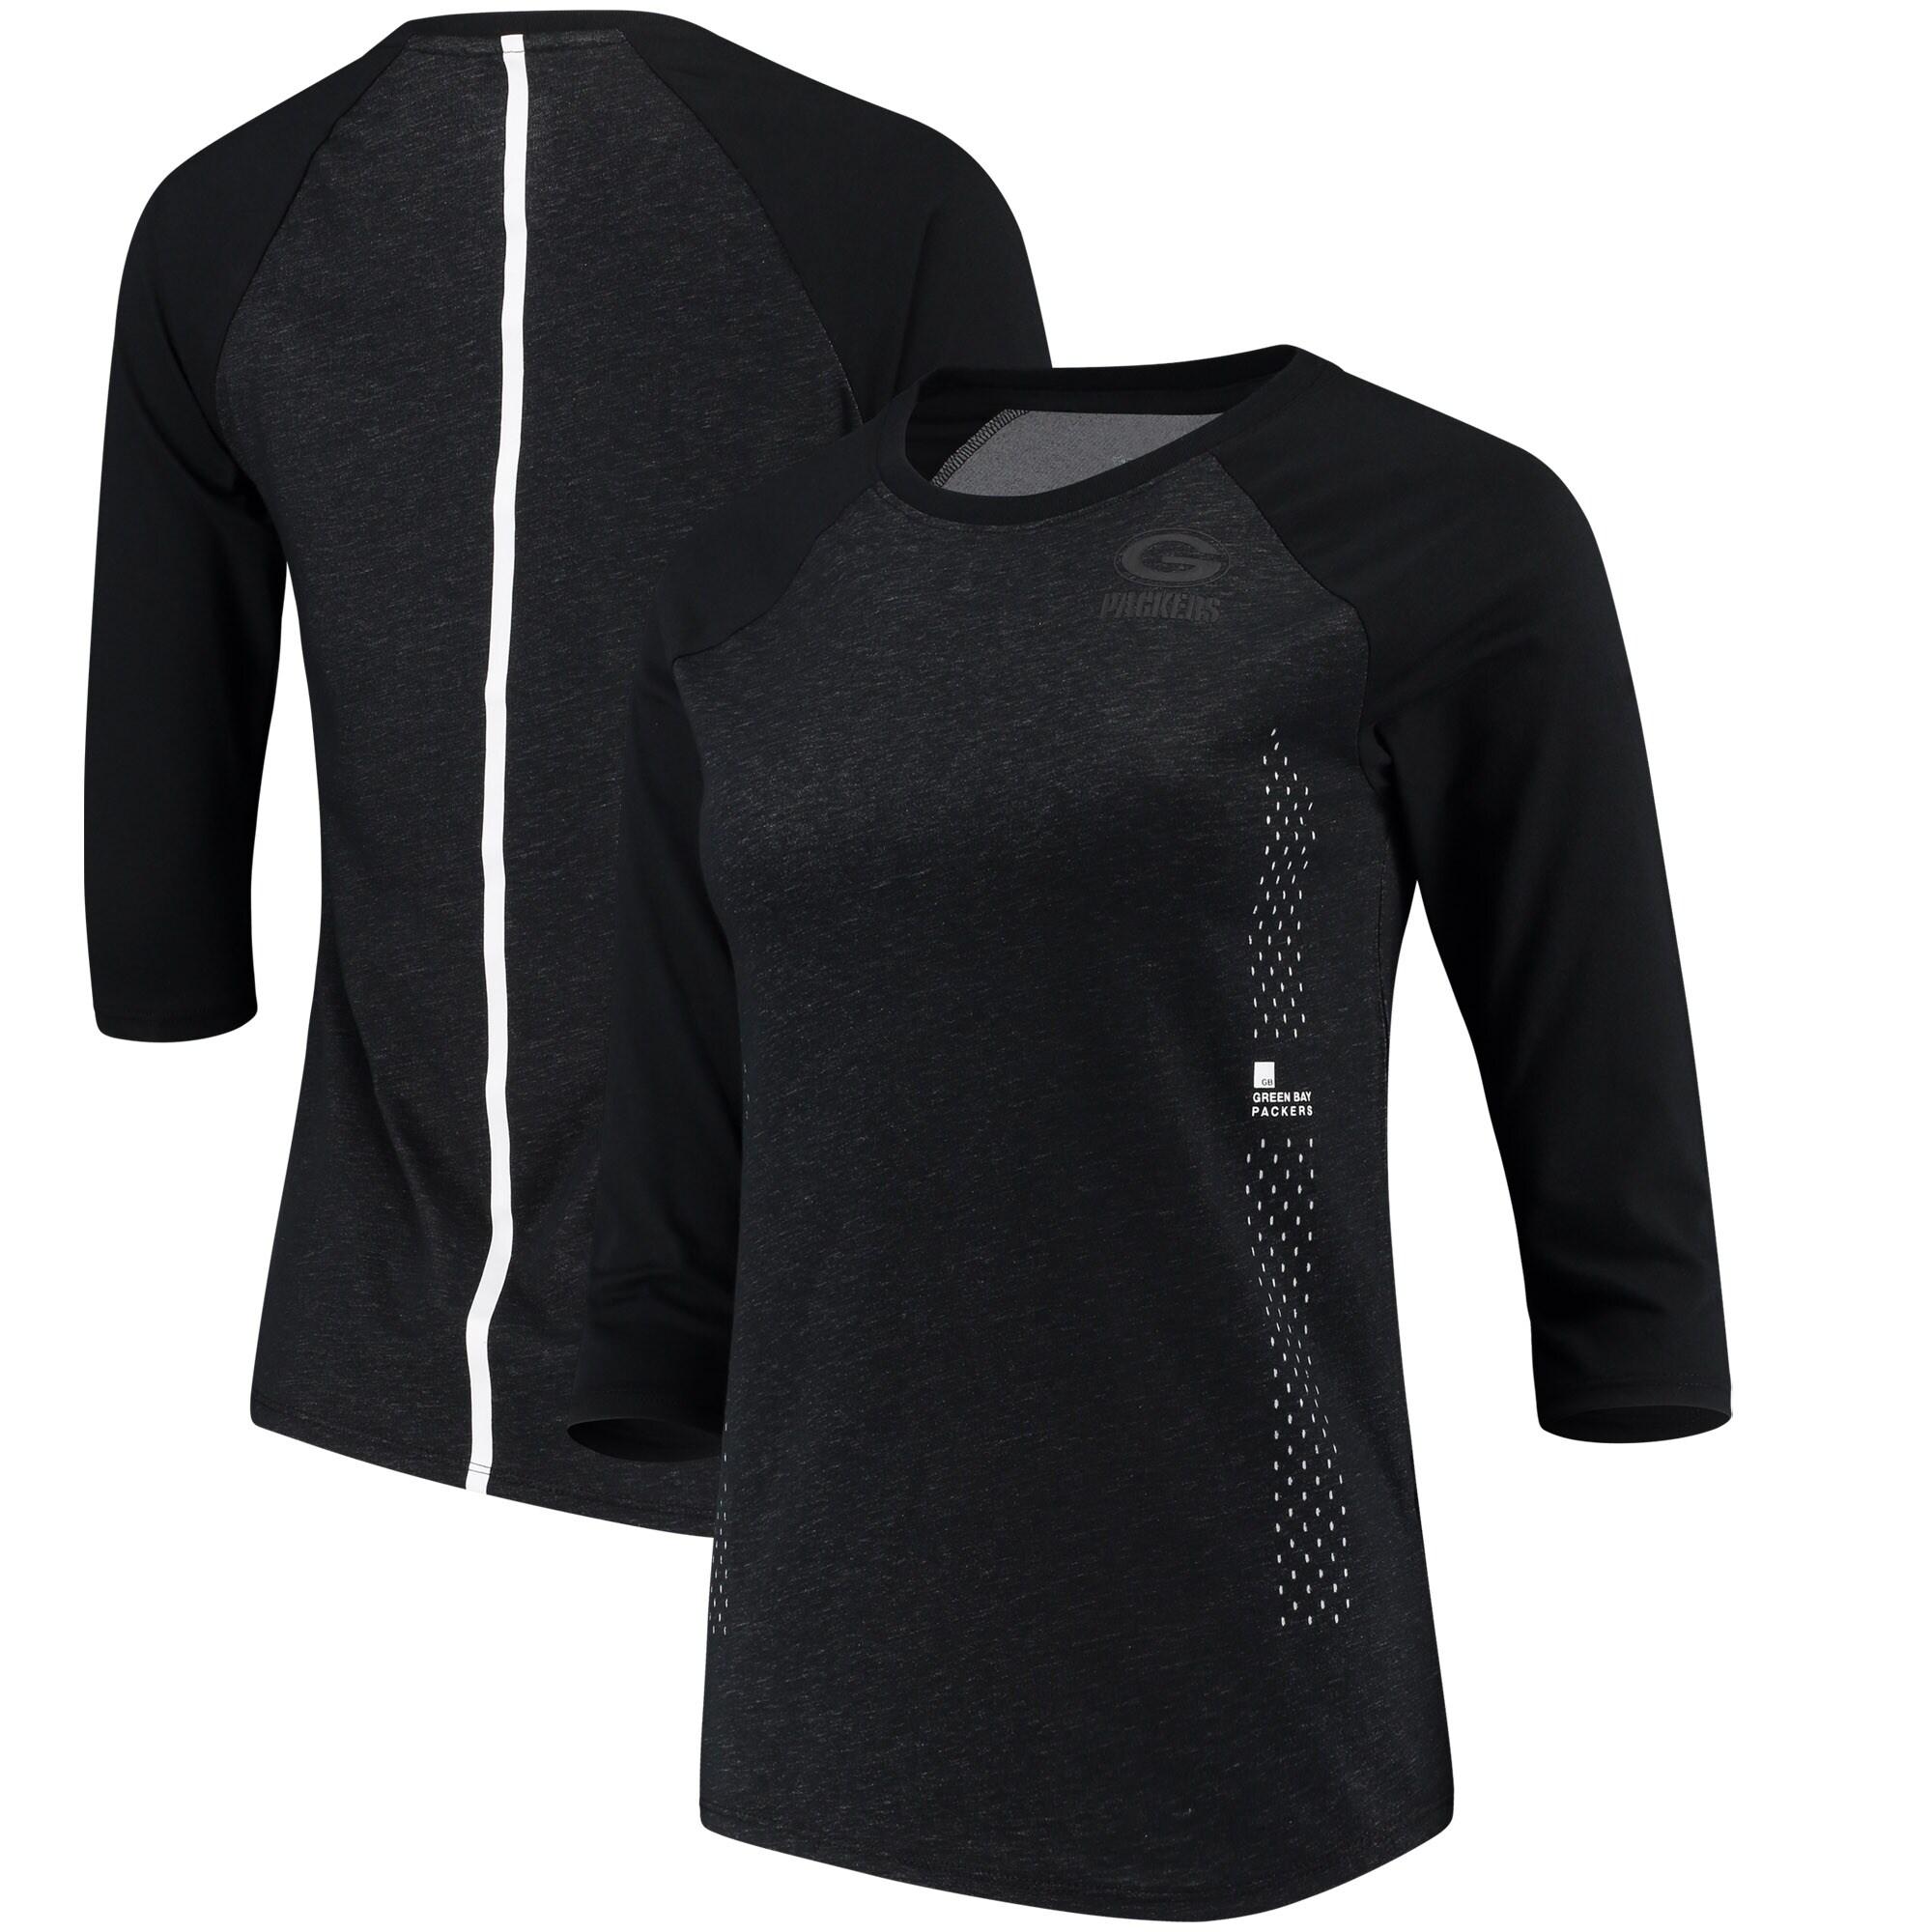 Green Bay Packers Nike Women's Performance Black Pack 3/4 Sleeve Raglan T-Shirt - Black